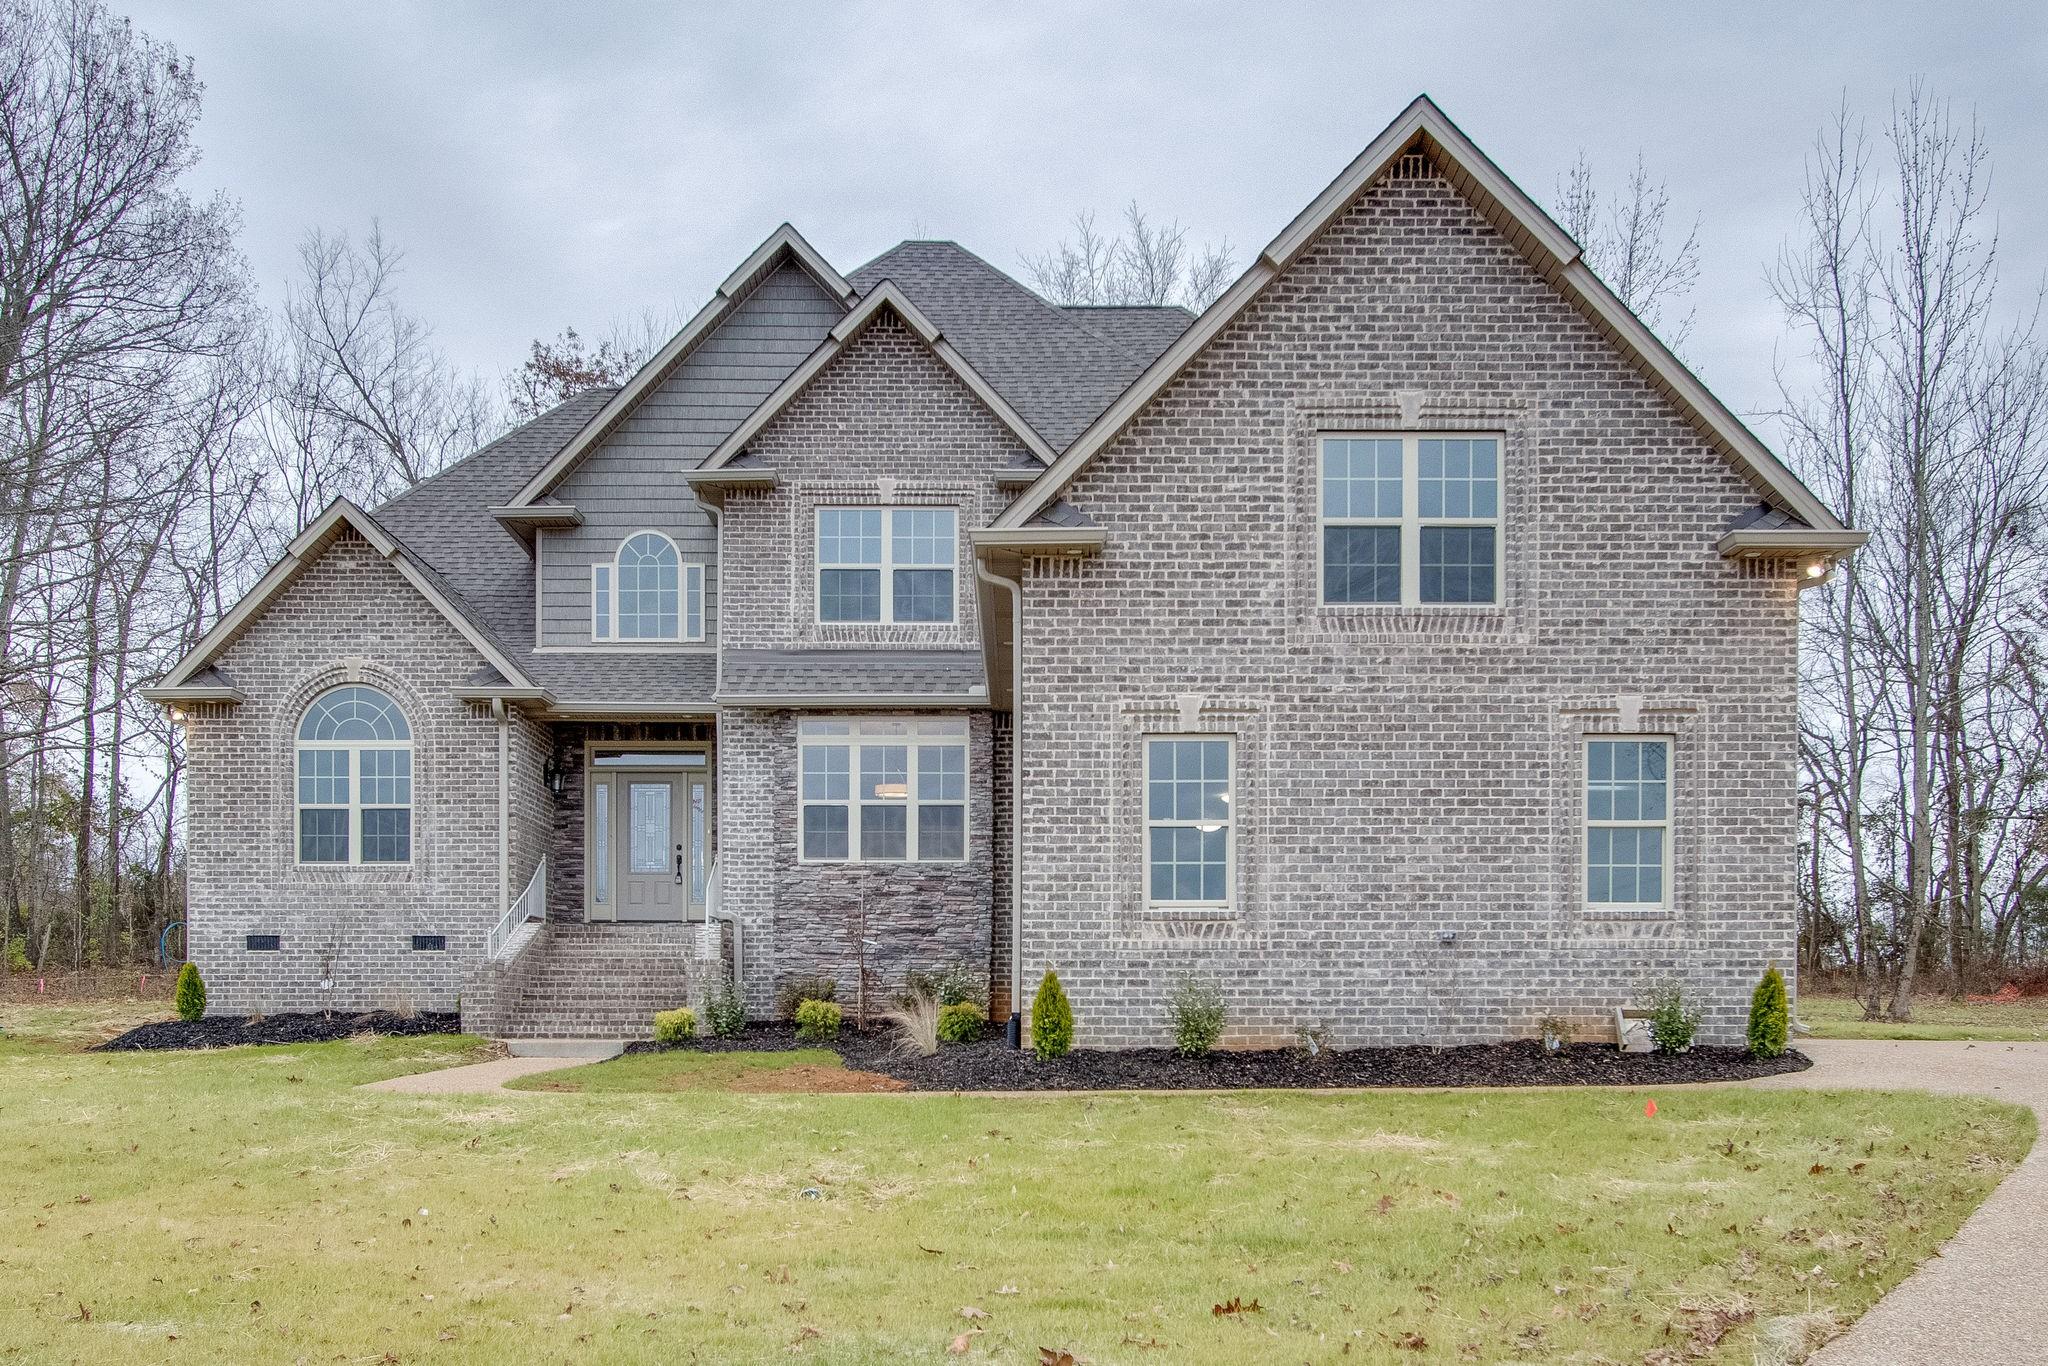 216 Ivie Lane, Lot 14, Lebanon, TN 37087 - Lebanon, TN real estate listing